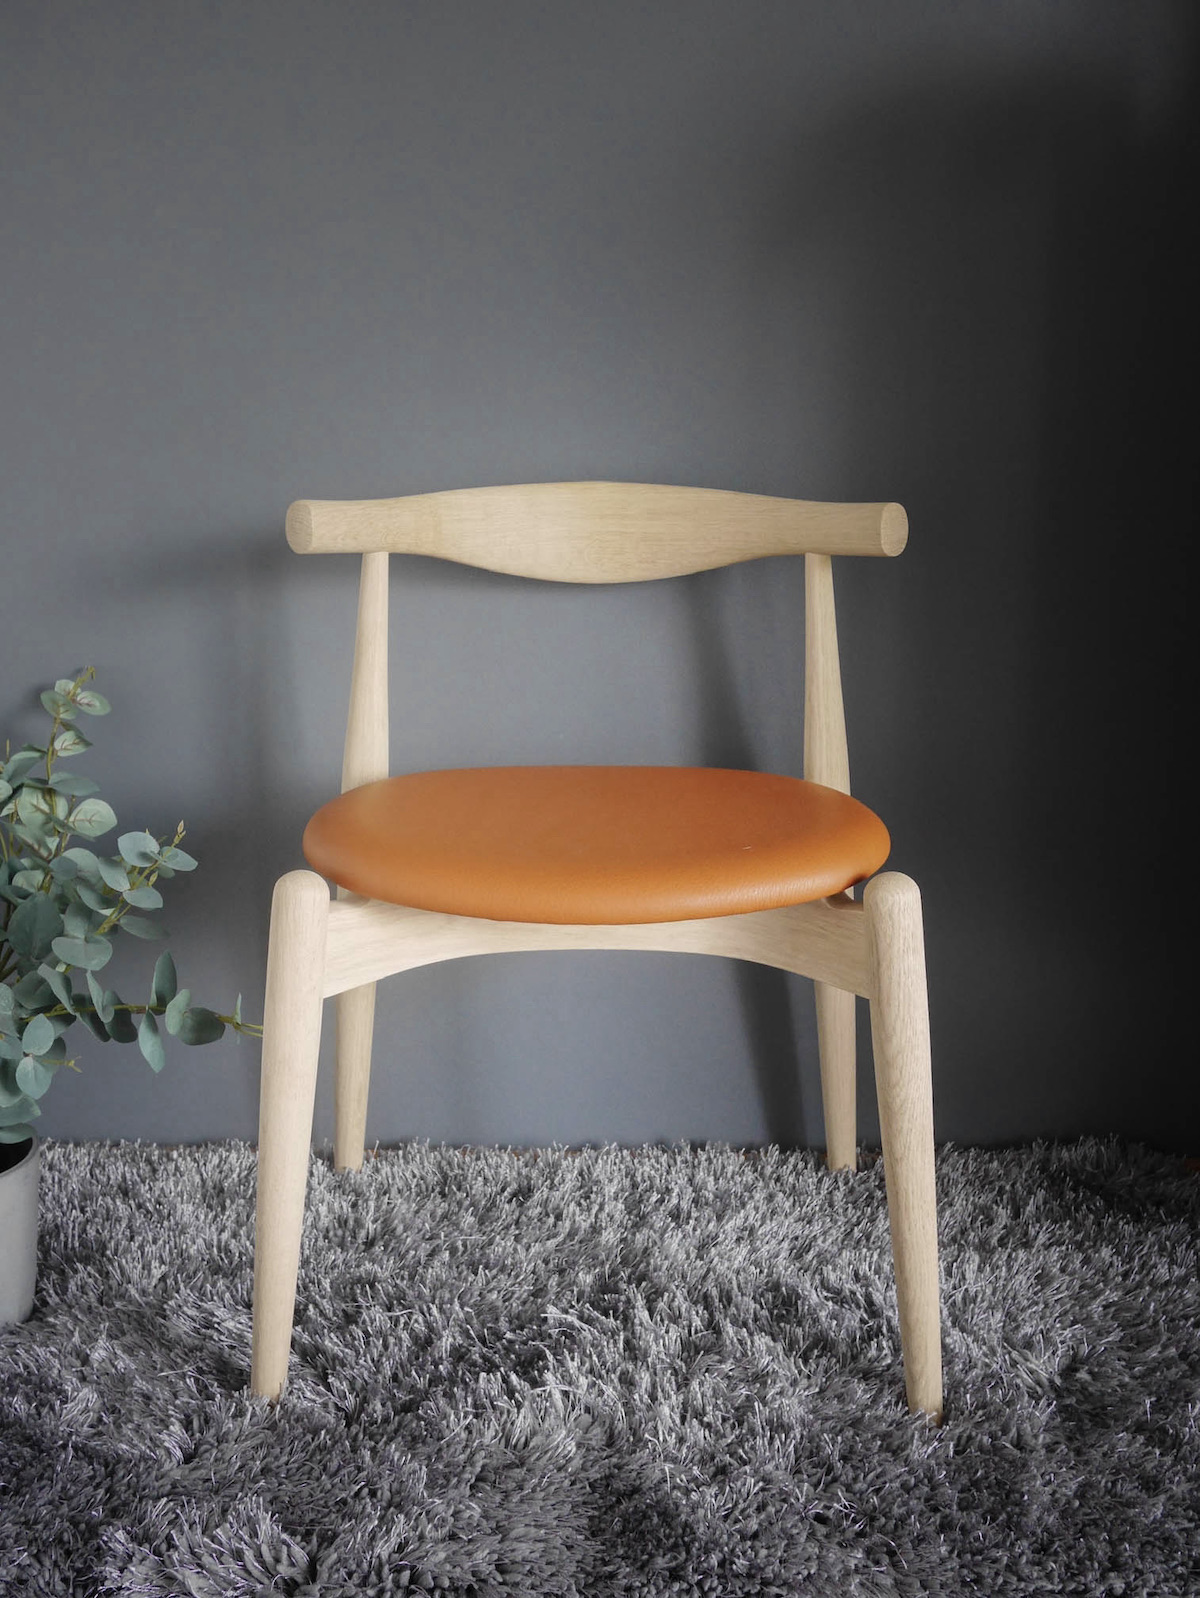 chaise danois bois cuir icône design CH20 ELBOW CHAIR Hans J. Wegner